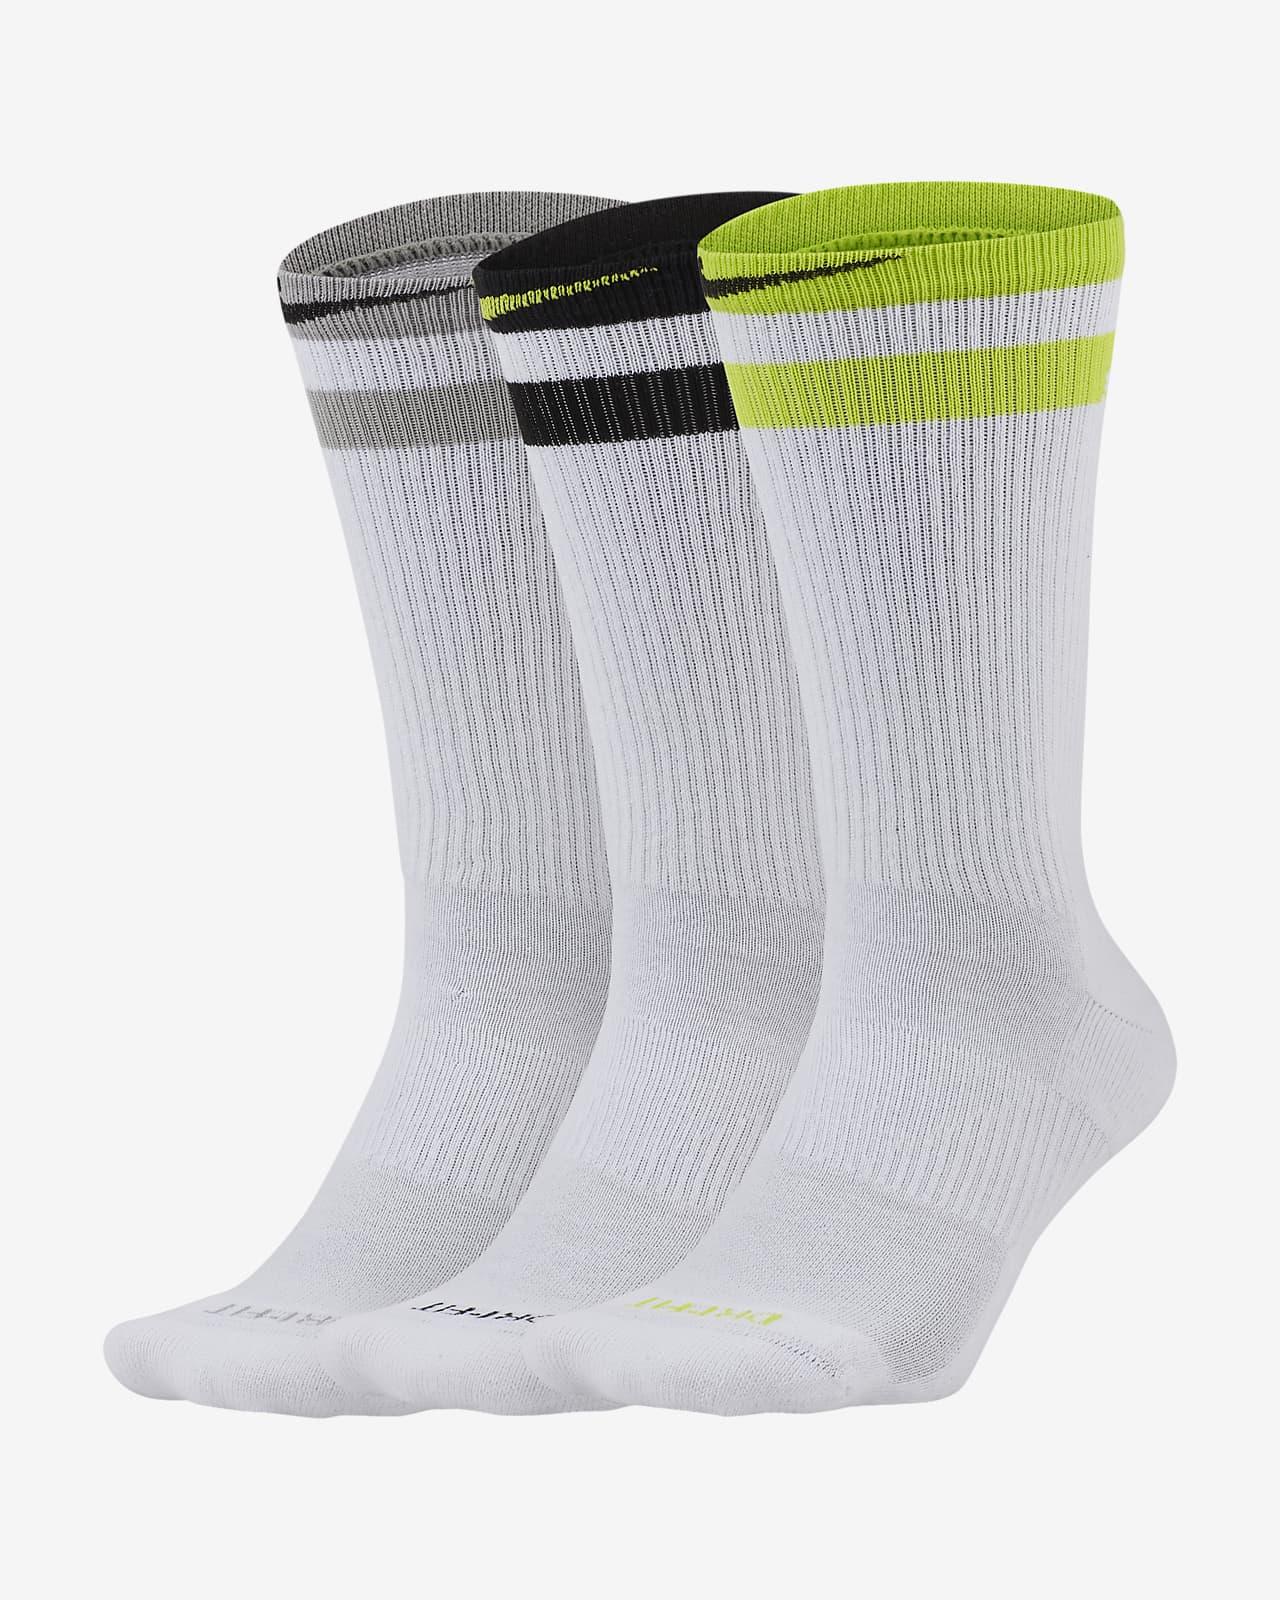 Nike Everyday Plus Cushioned 训练运动袜(3 双)